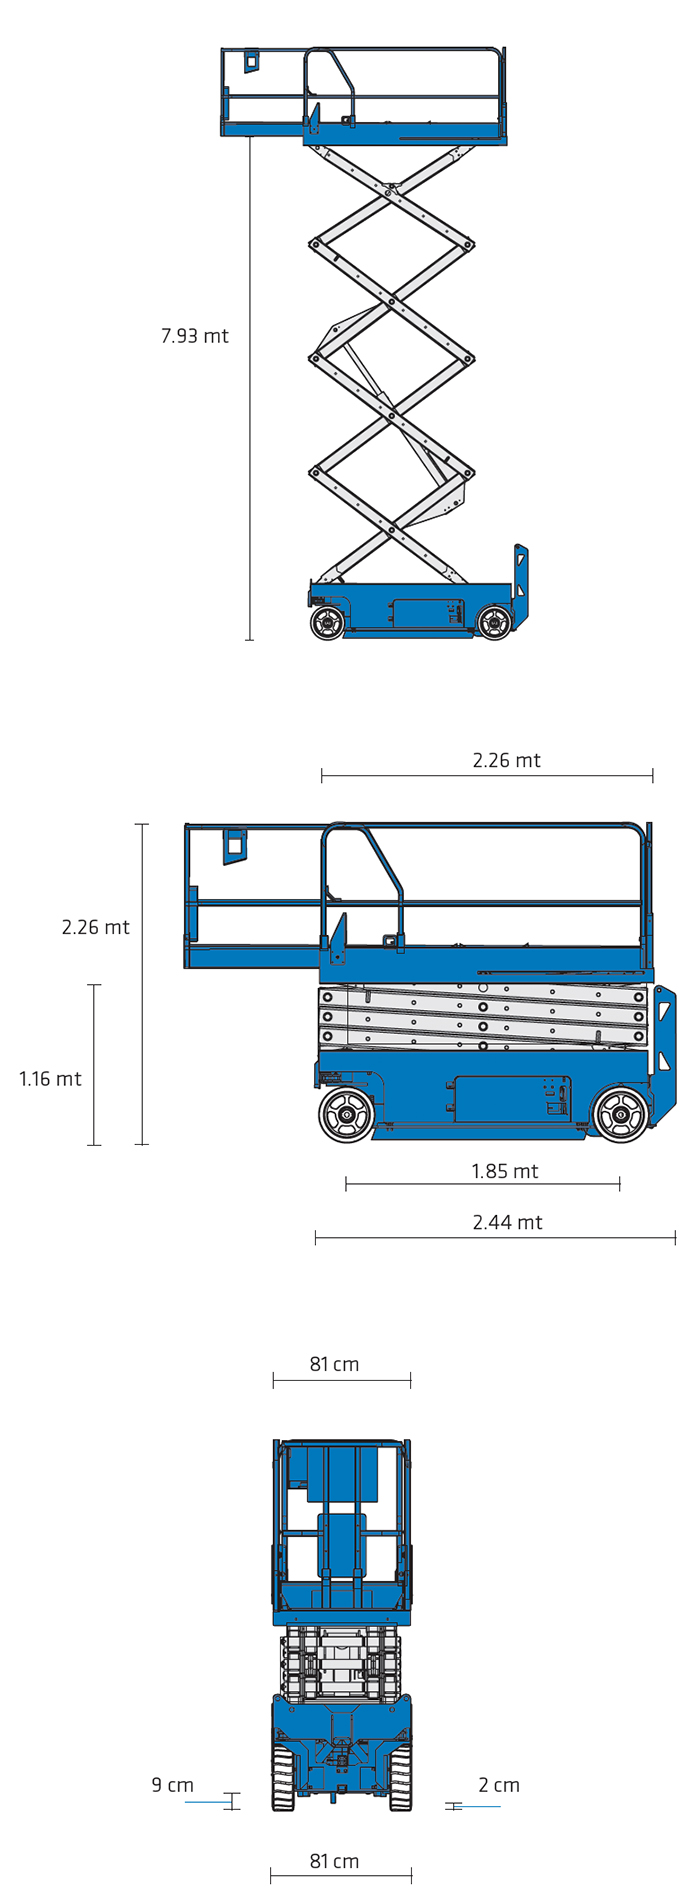 Piattaforma Semovente Verticale Elettrica VE 10 GE - GS 2632